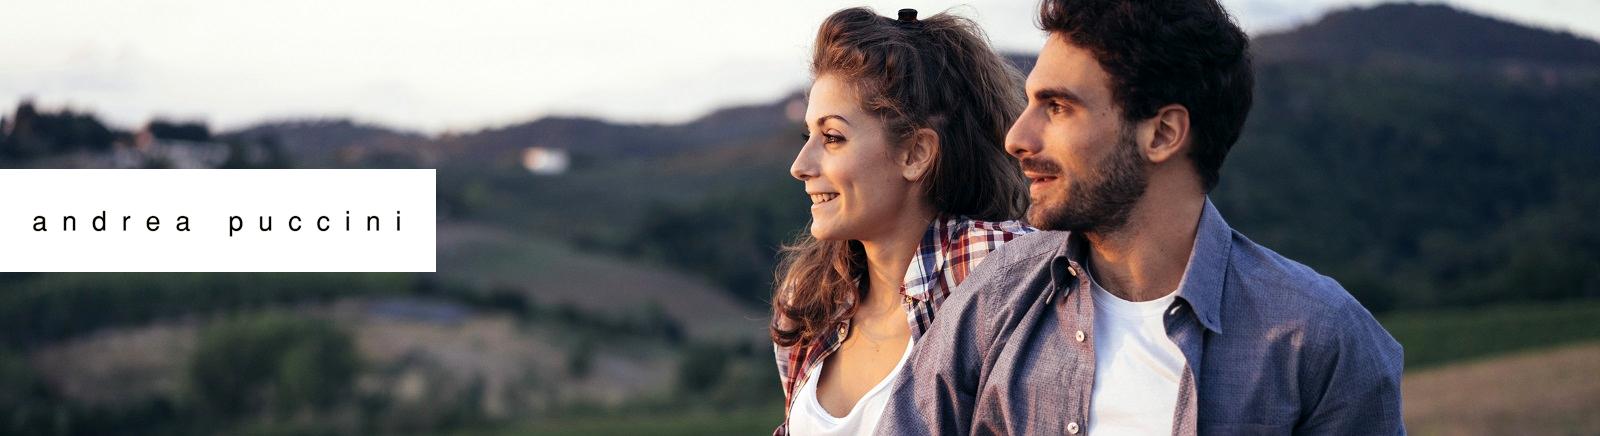 Gisy: Andrea Puccini Plateau-Pumps für Damen online shoppen